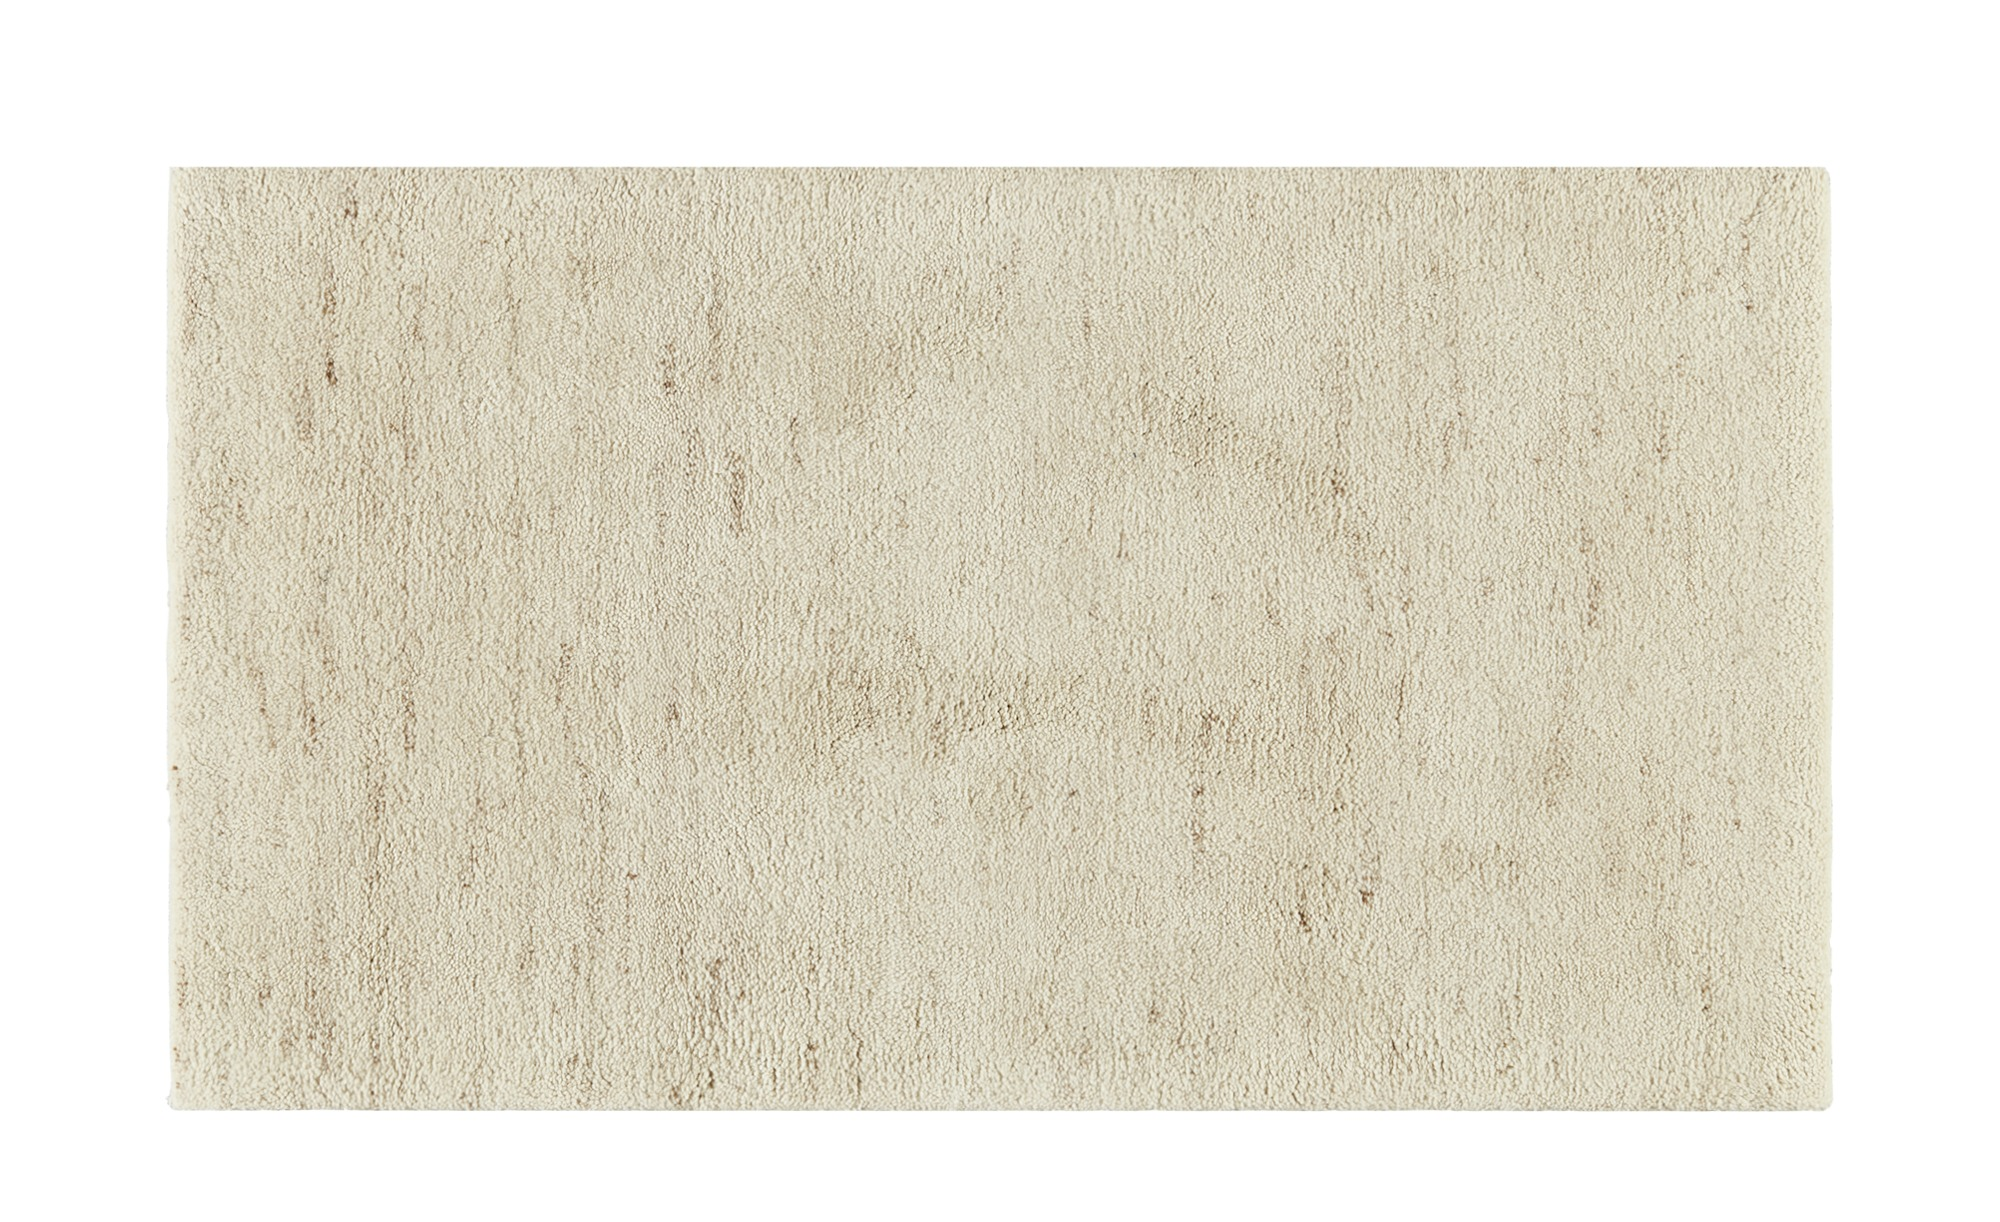 Berber-Teppich  Marrakesh double ¦ creme ¦ 100 % Wolle ¦ Maße (cm): B: 90 Teppiche > Auslegware - Höffner | Heimtextilien > Teppiche > Berberteppiche | Creme | Wolle | Möbel Höffner DE